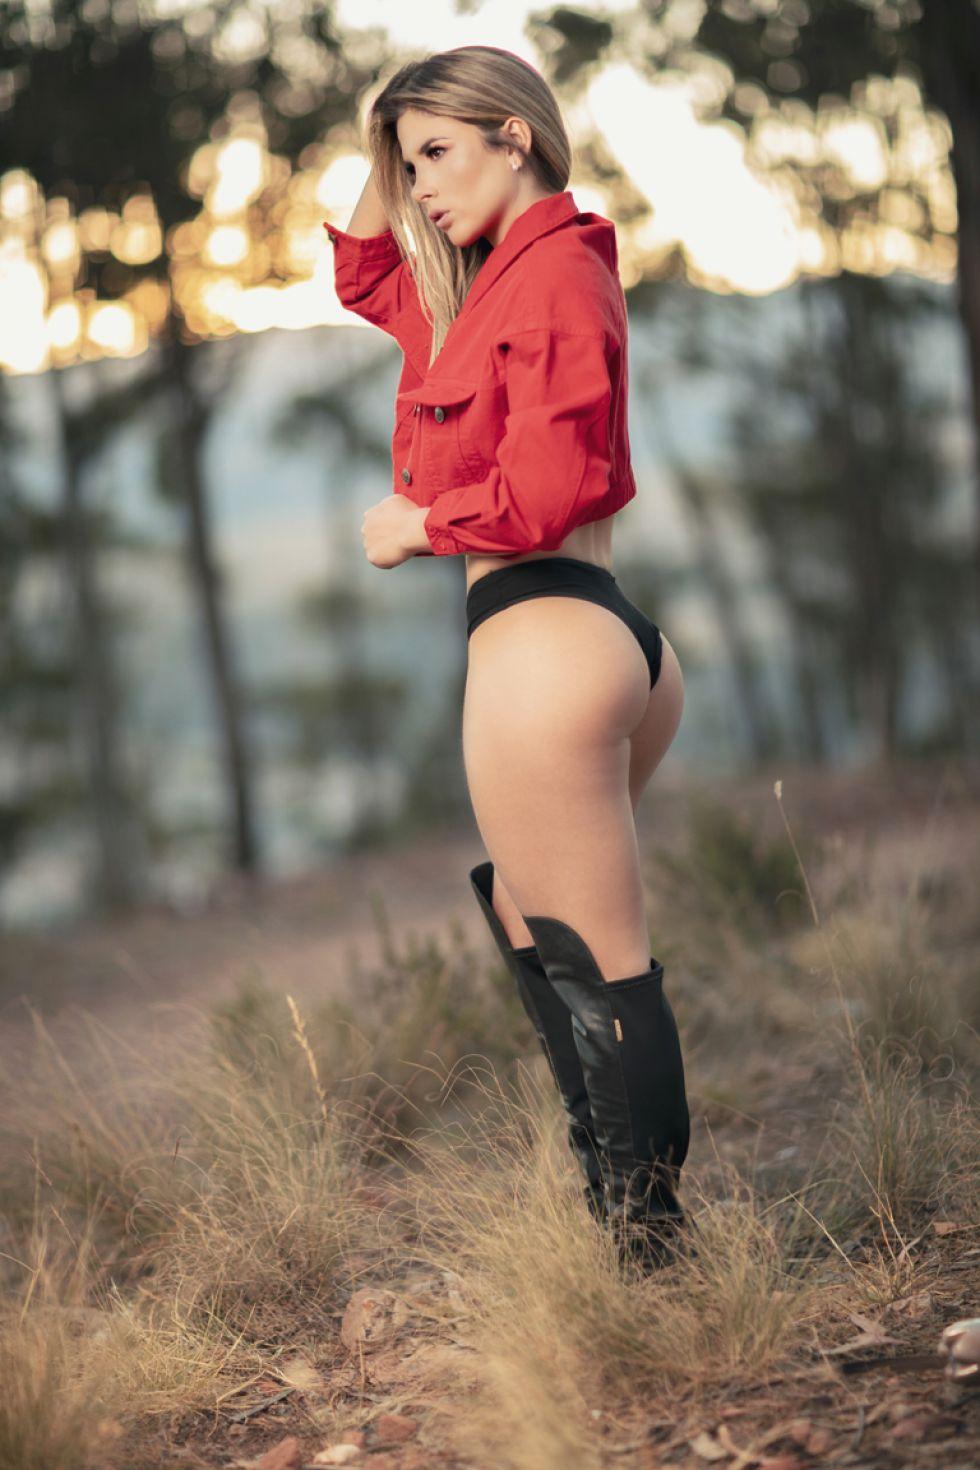 Miss Bolivia Bikini Fitness 2019